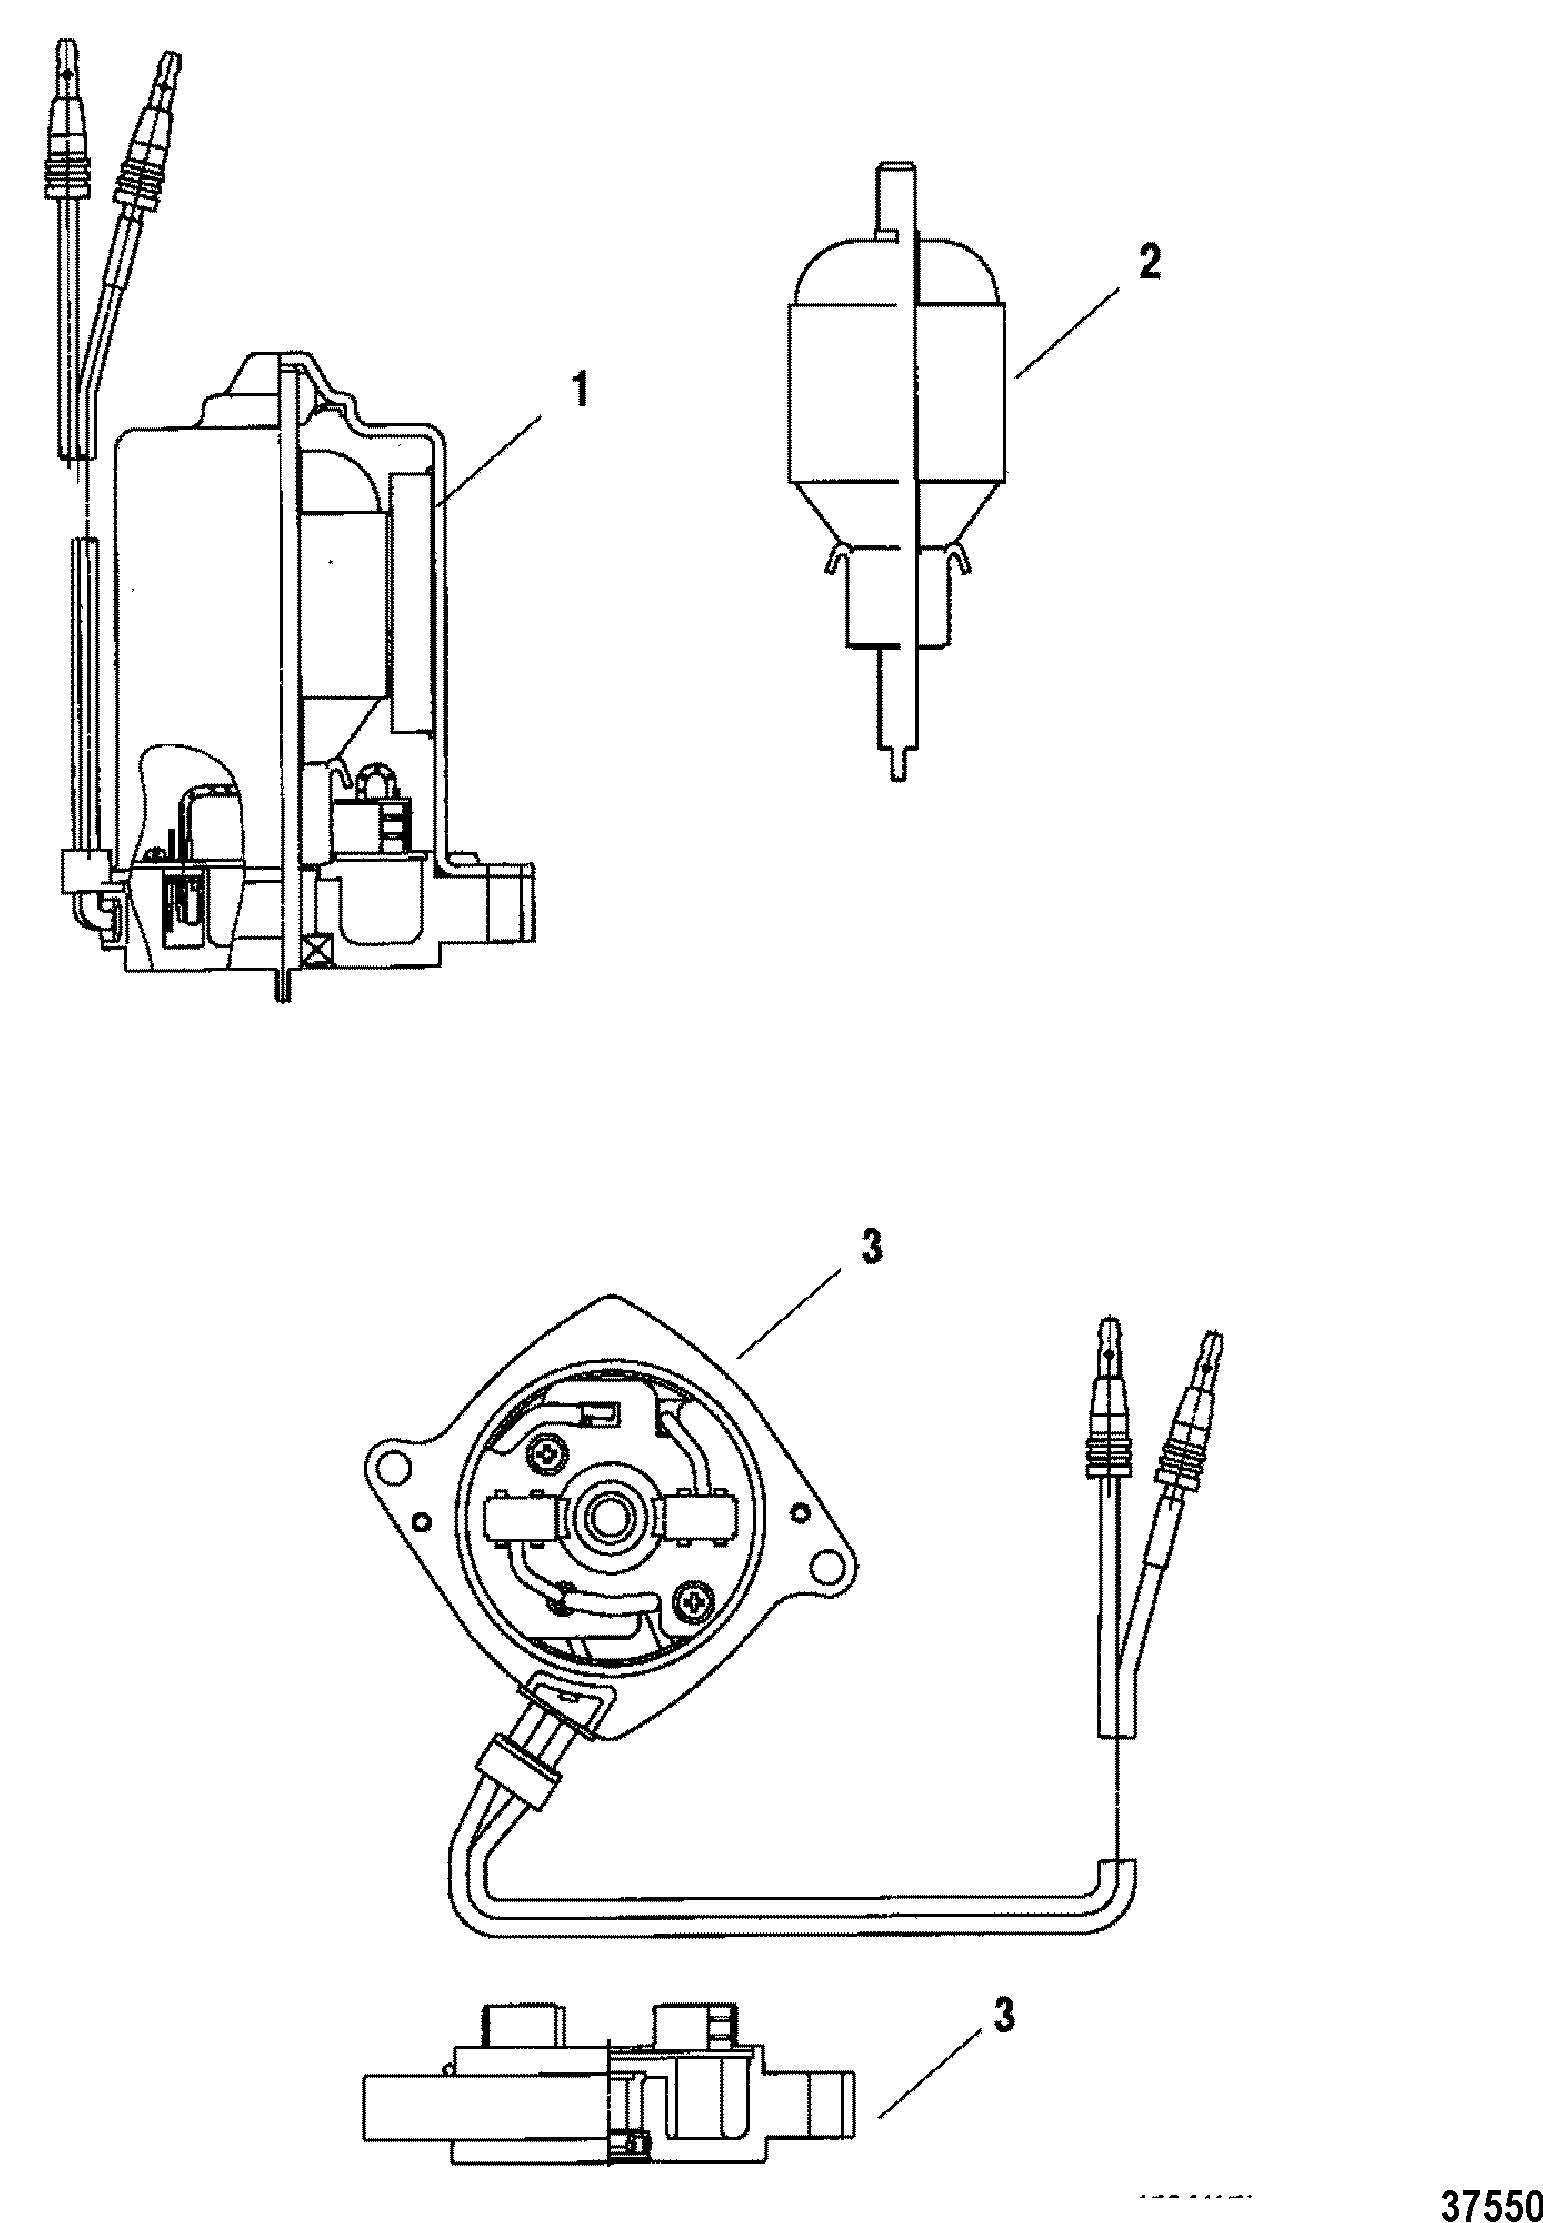 Power Trim Motor For Mariner Mercury 150 175 200 Efi